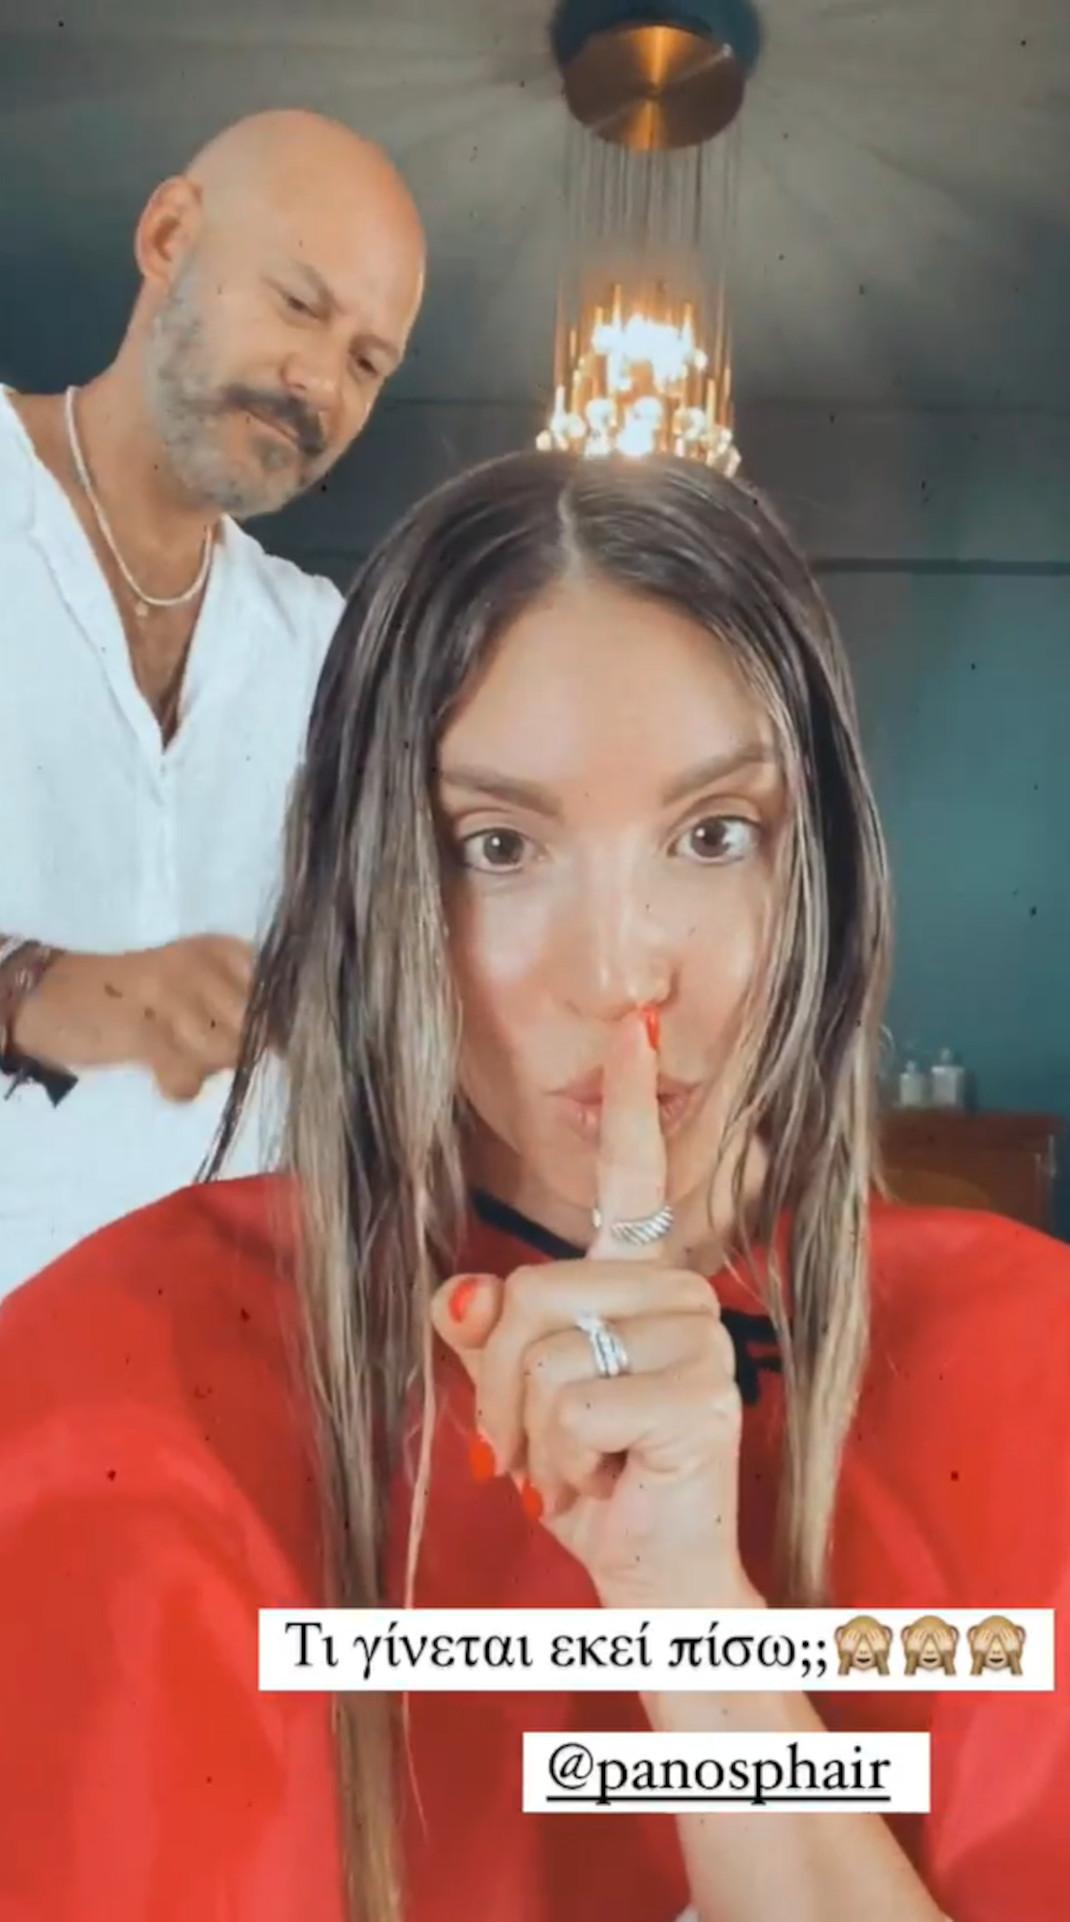 H Aθηνά Οικονομάκου έκοψε τα μαλλιά της